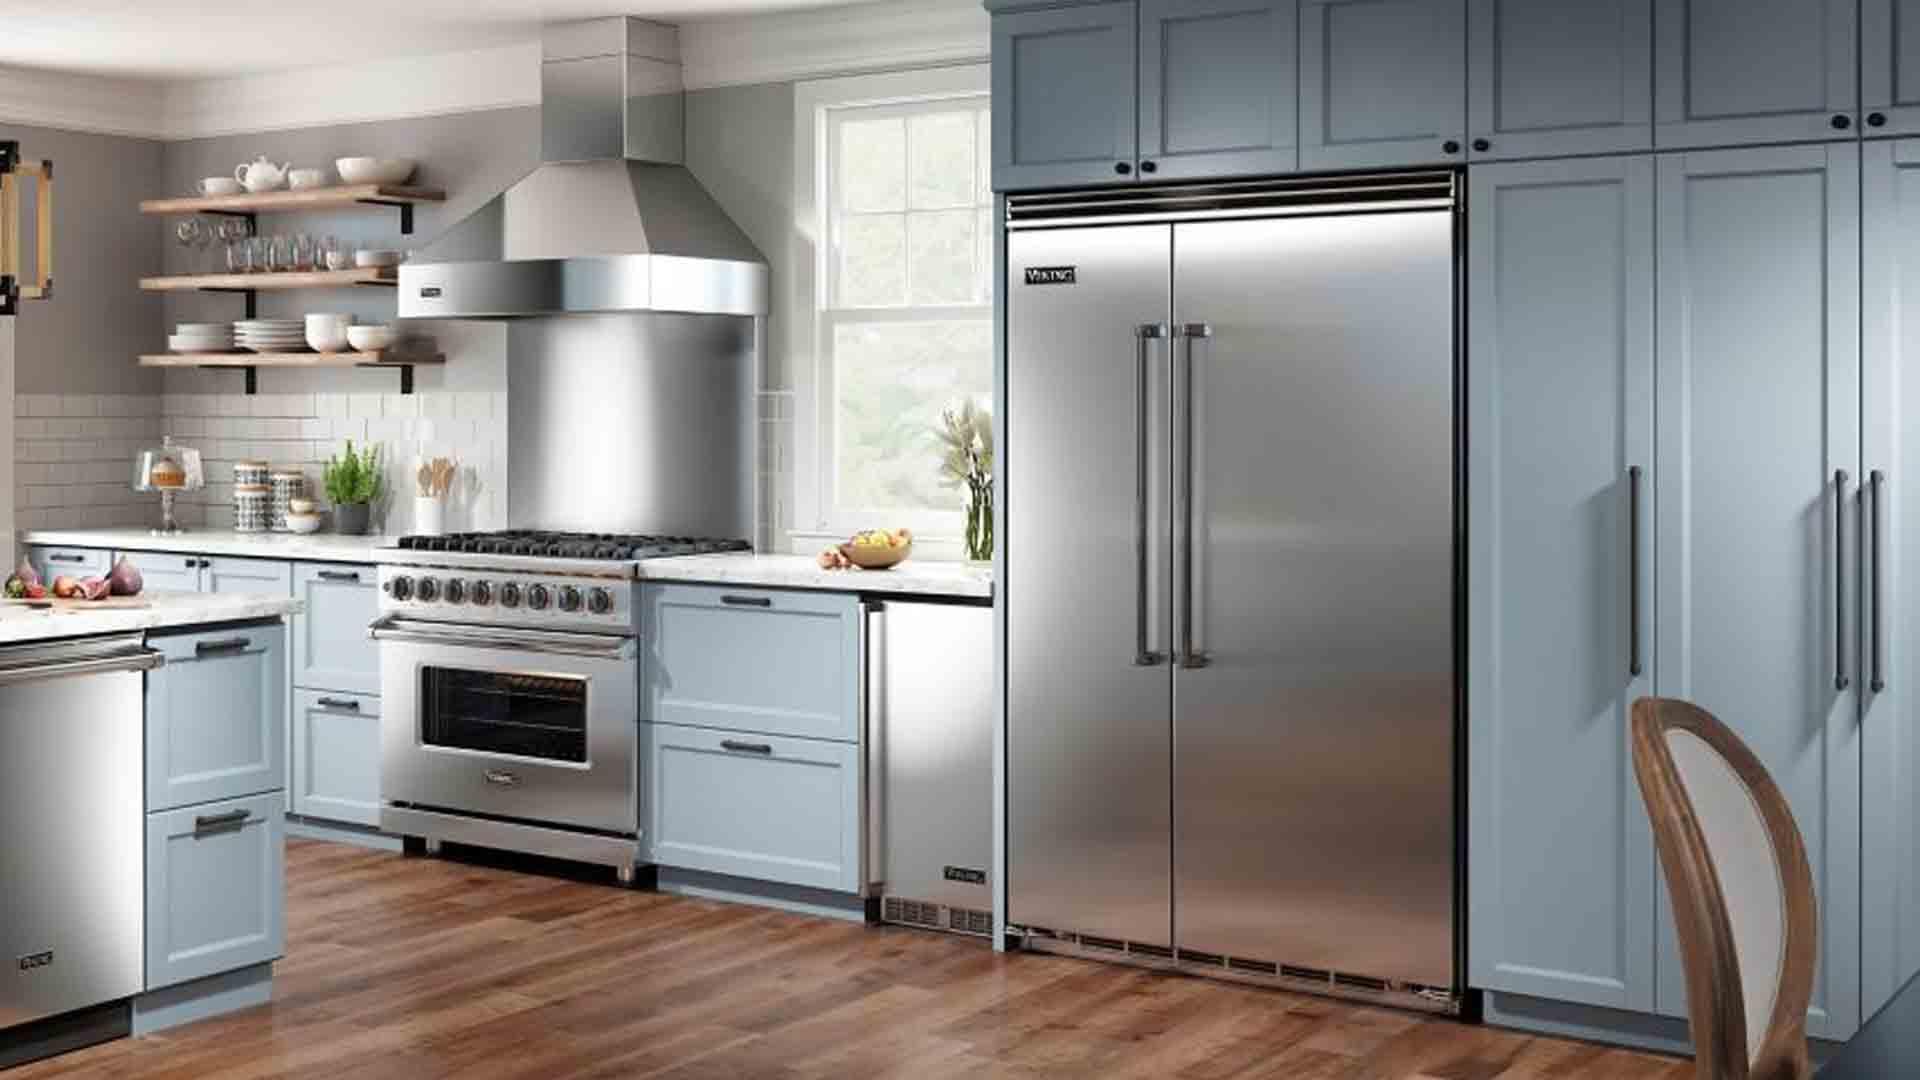 Viking Built-In Side by Side Refrigerator Repair Service | Viking Appliance Repairs